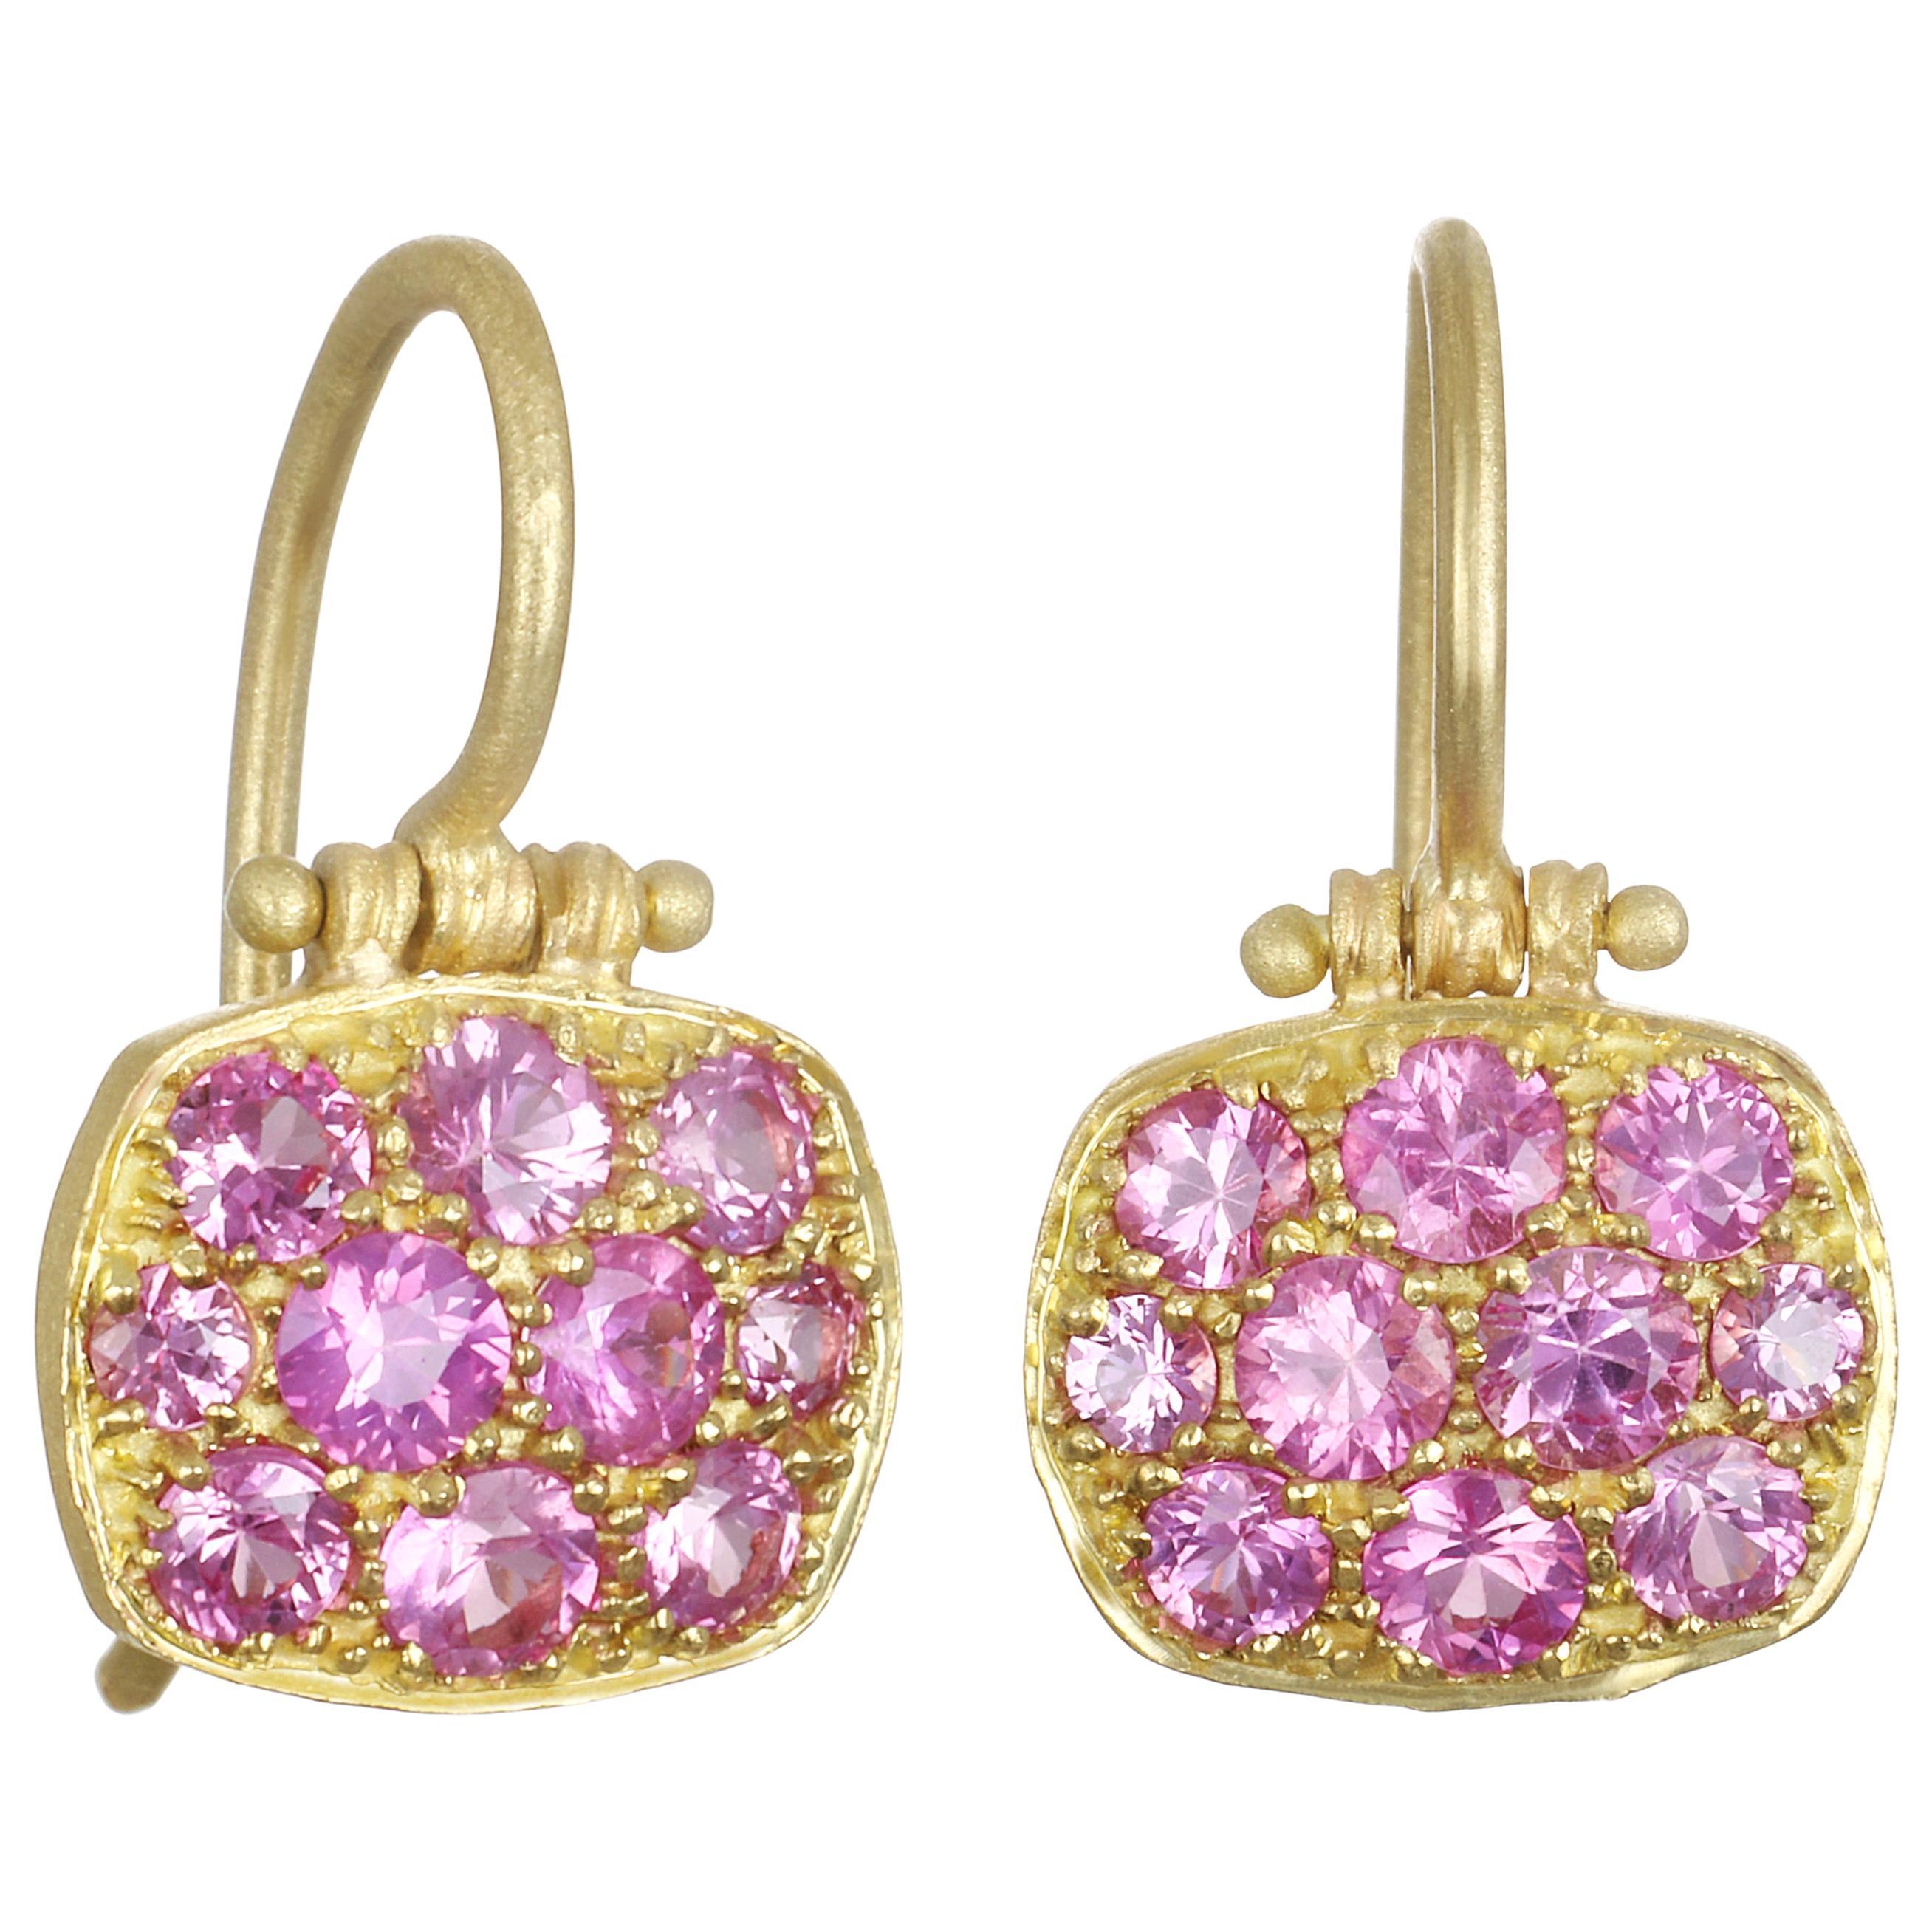 Faye Kim 18 Karat Pink Sapphire Chiclet Earrings